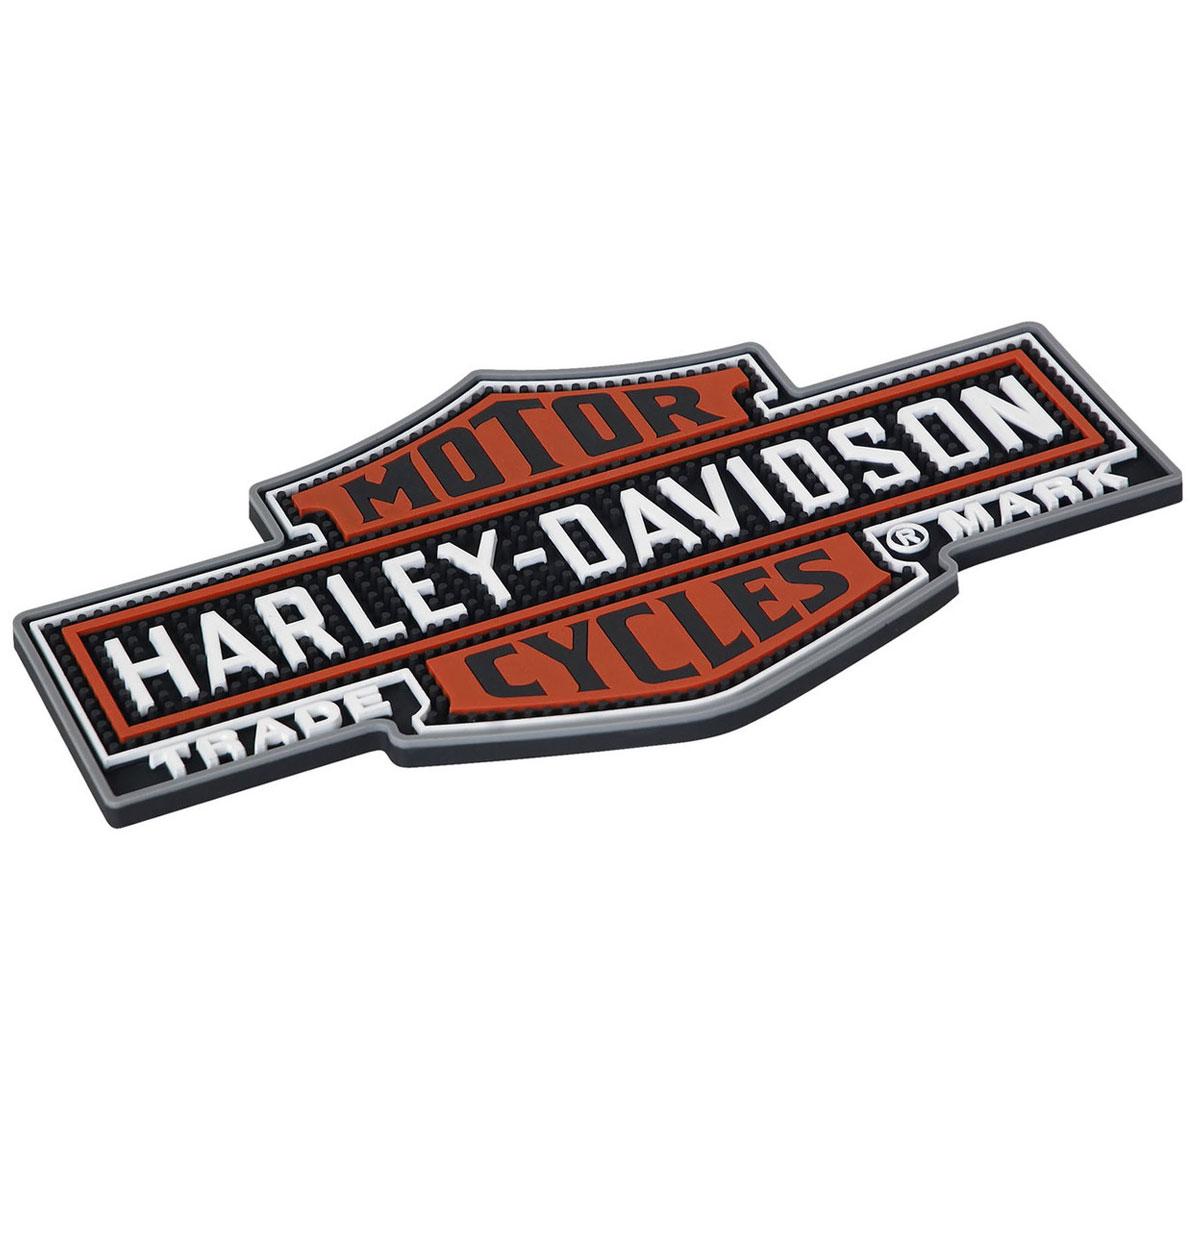 Harley-Davidson Nostalgic Bar & Shield Beverage Mat